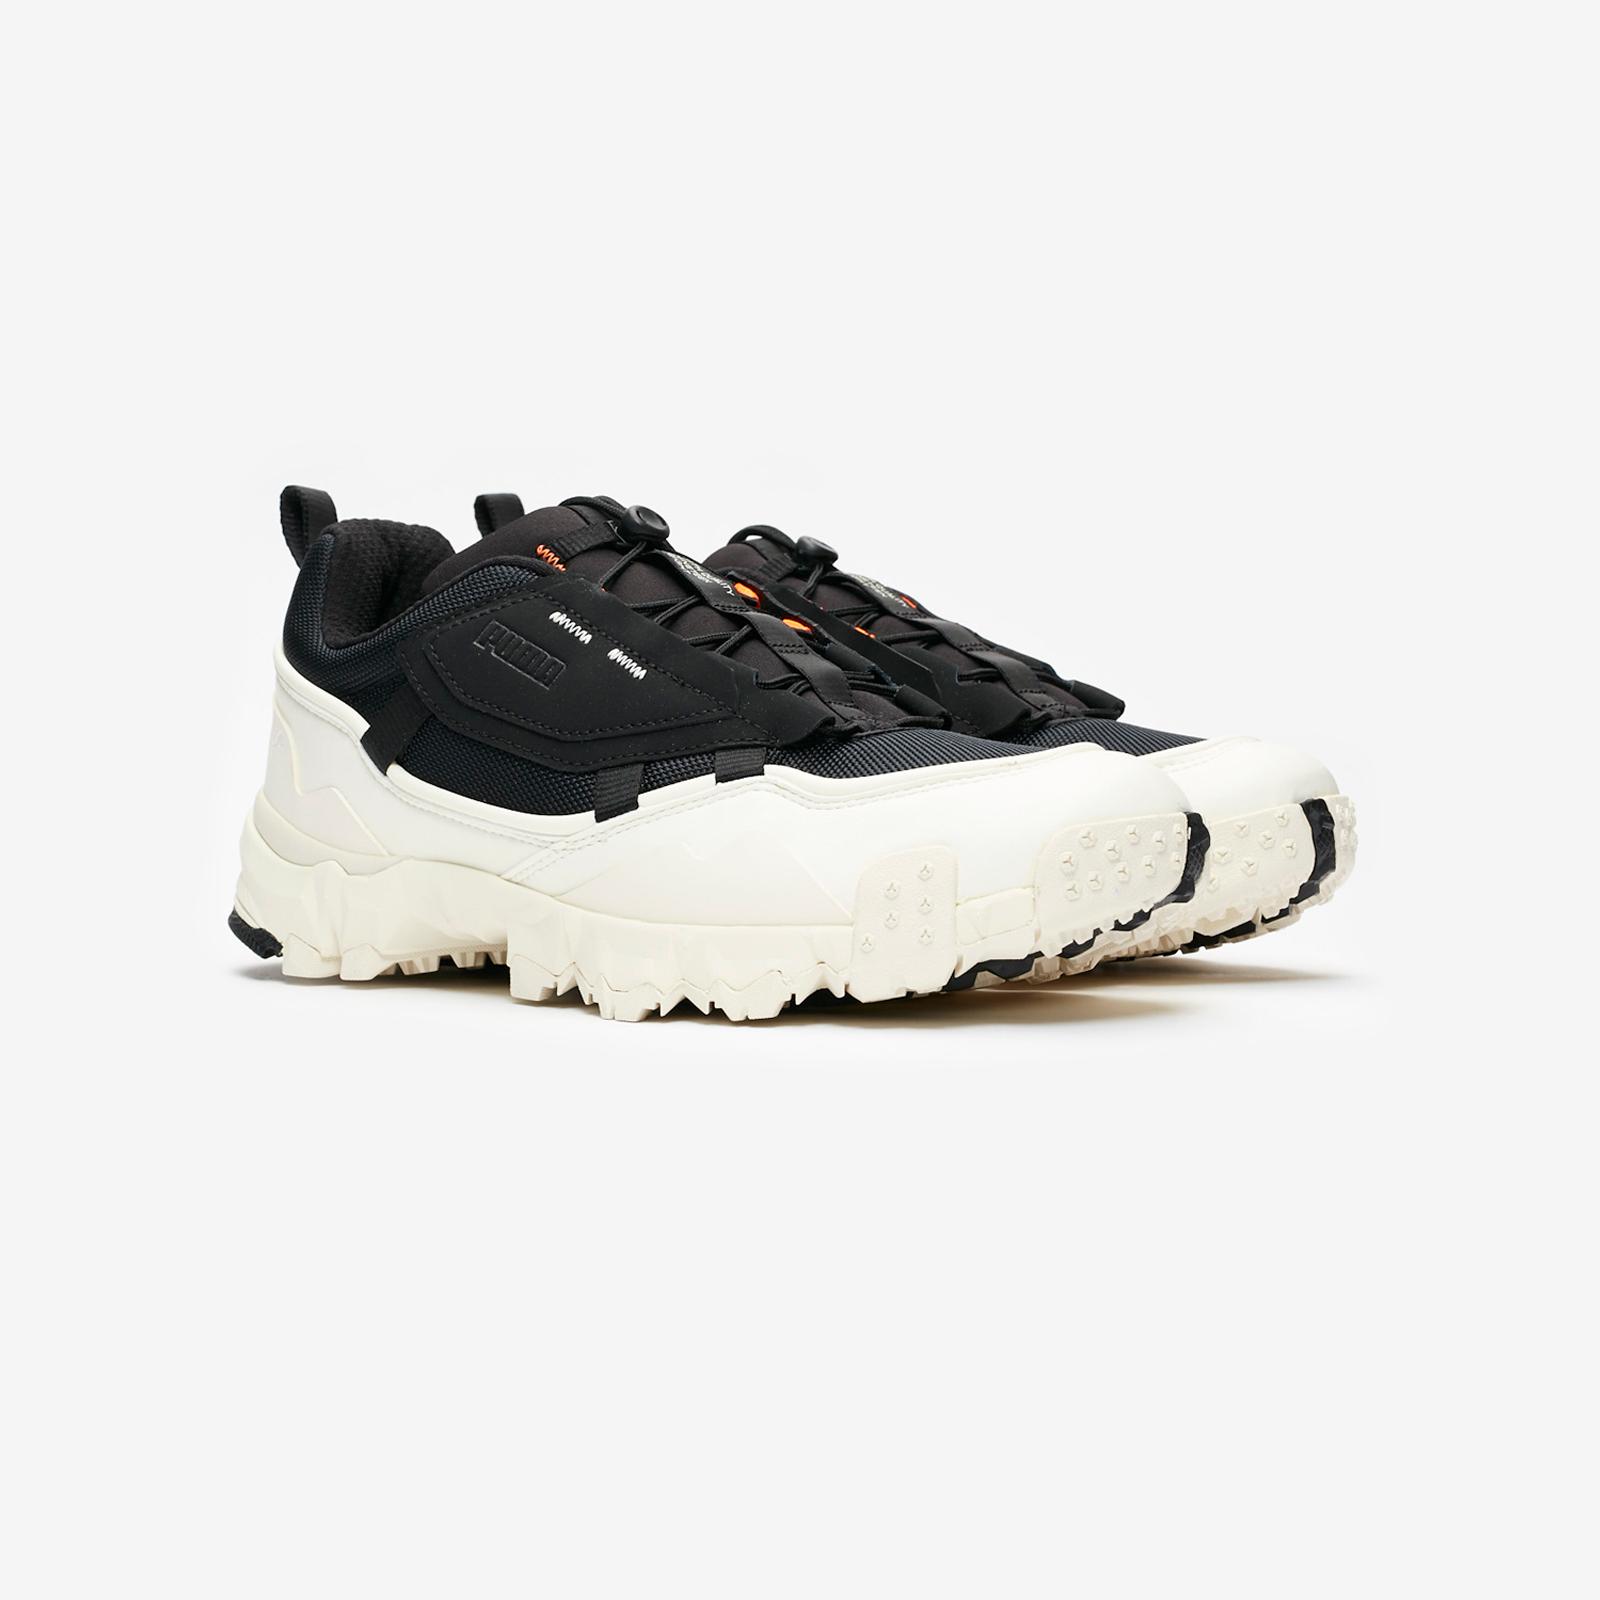 Puma Trailfox Overland 369824 01 Sneakersnstuff I